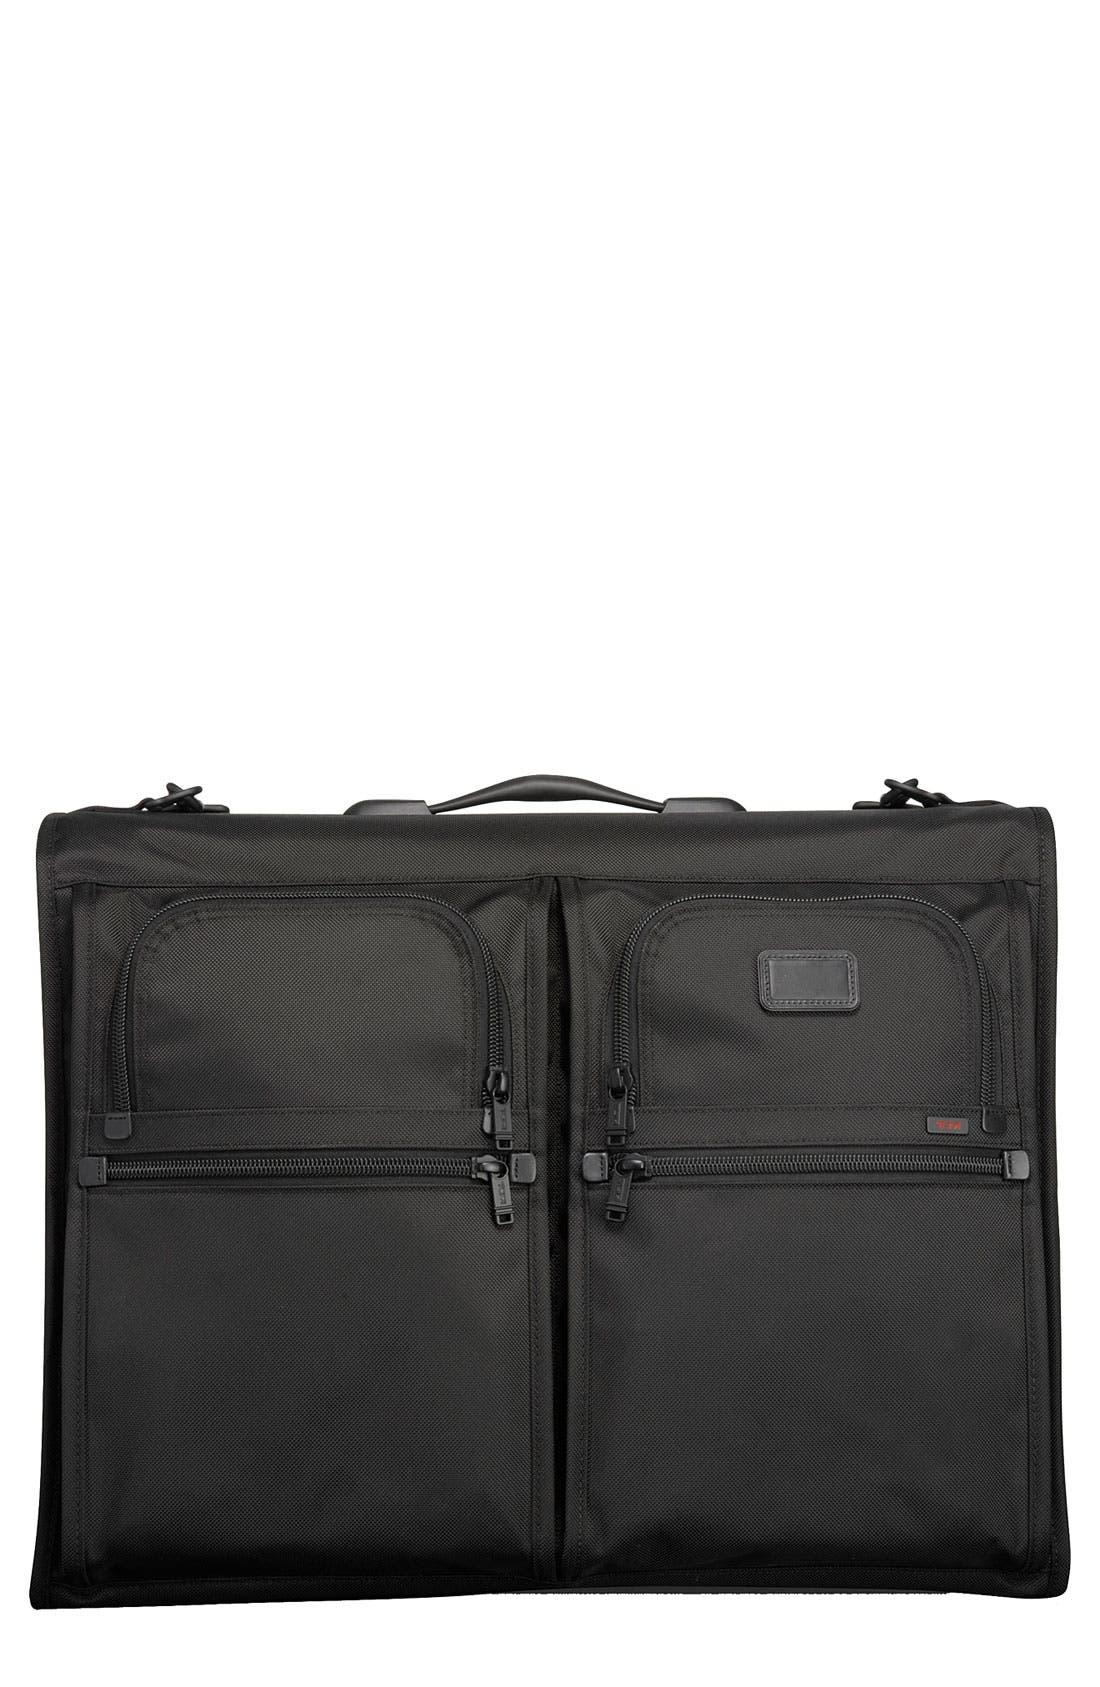 Alternate Image 1 Selected - Tumi 'Alpha' Classic Garment Bag